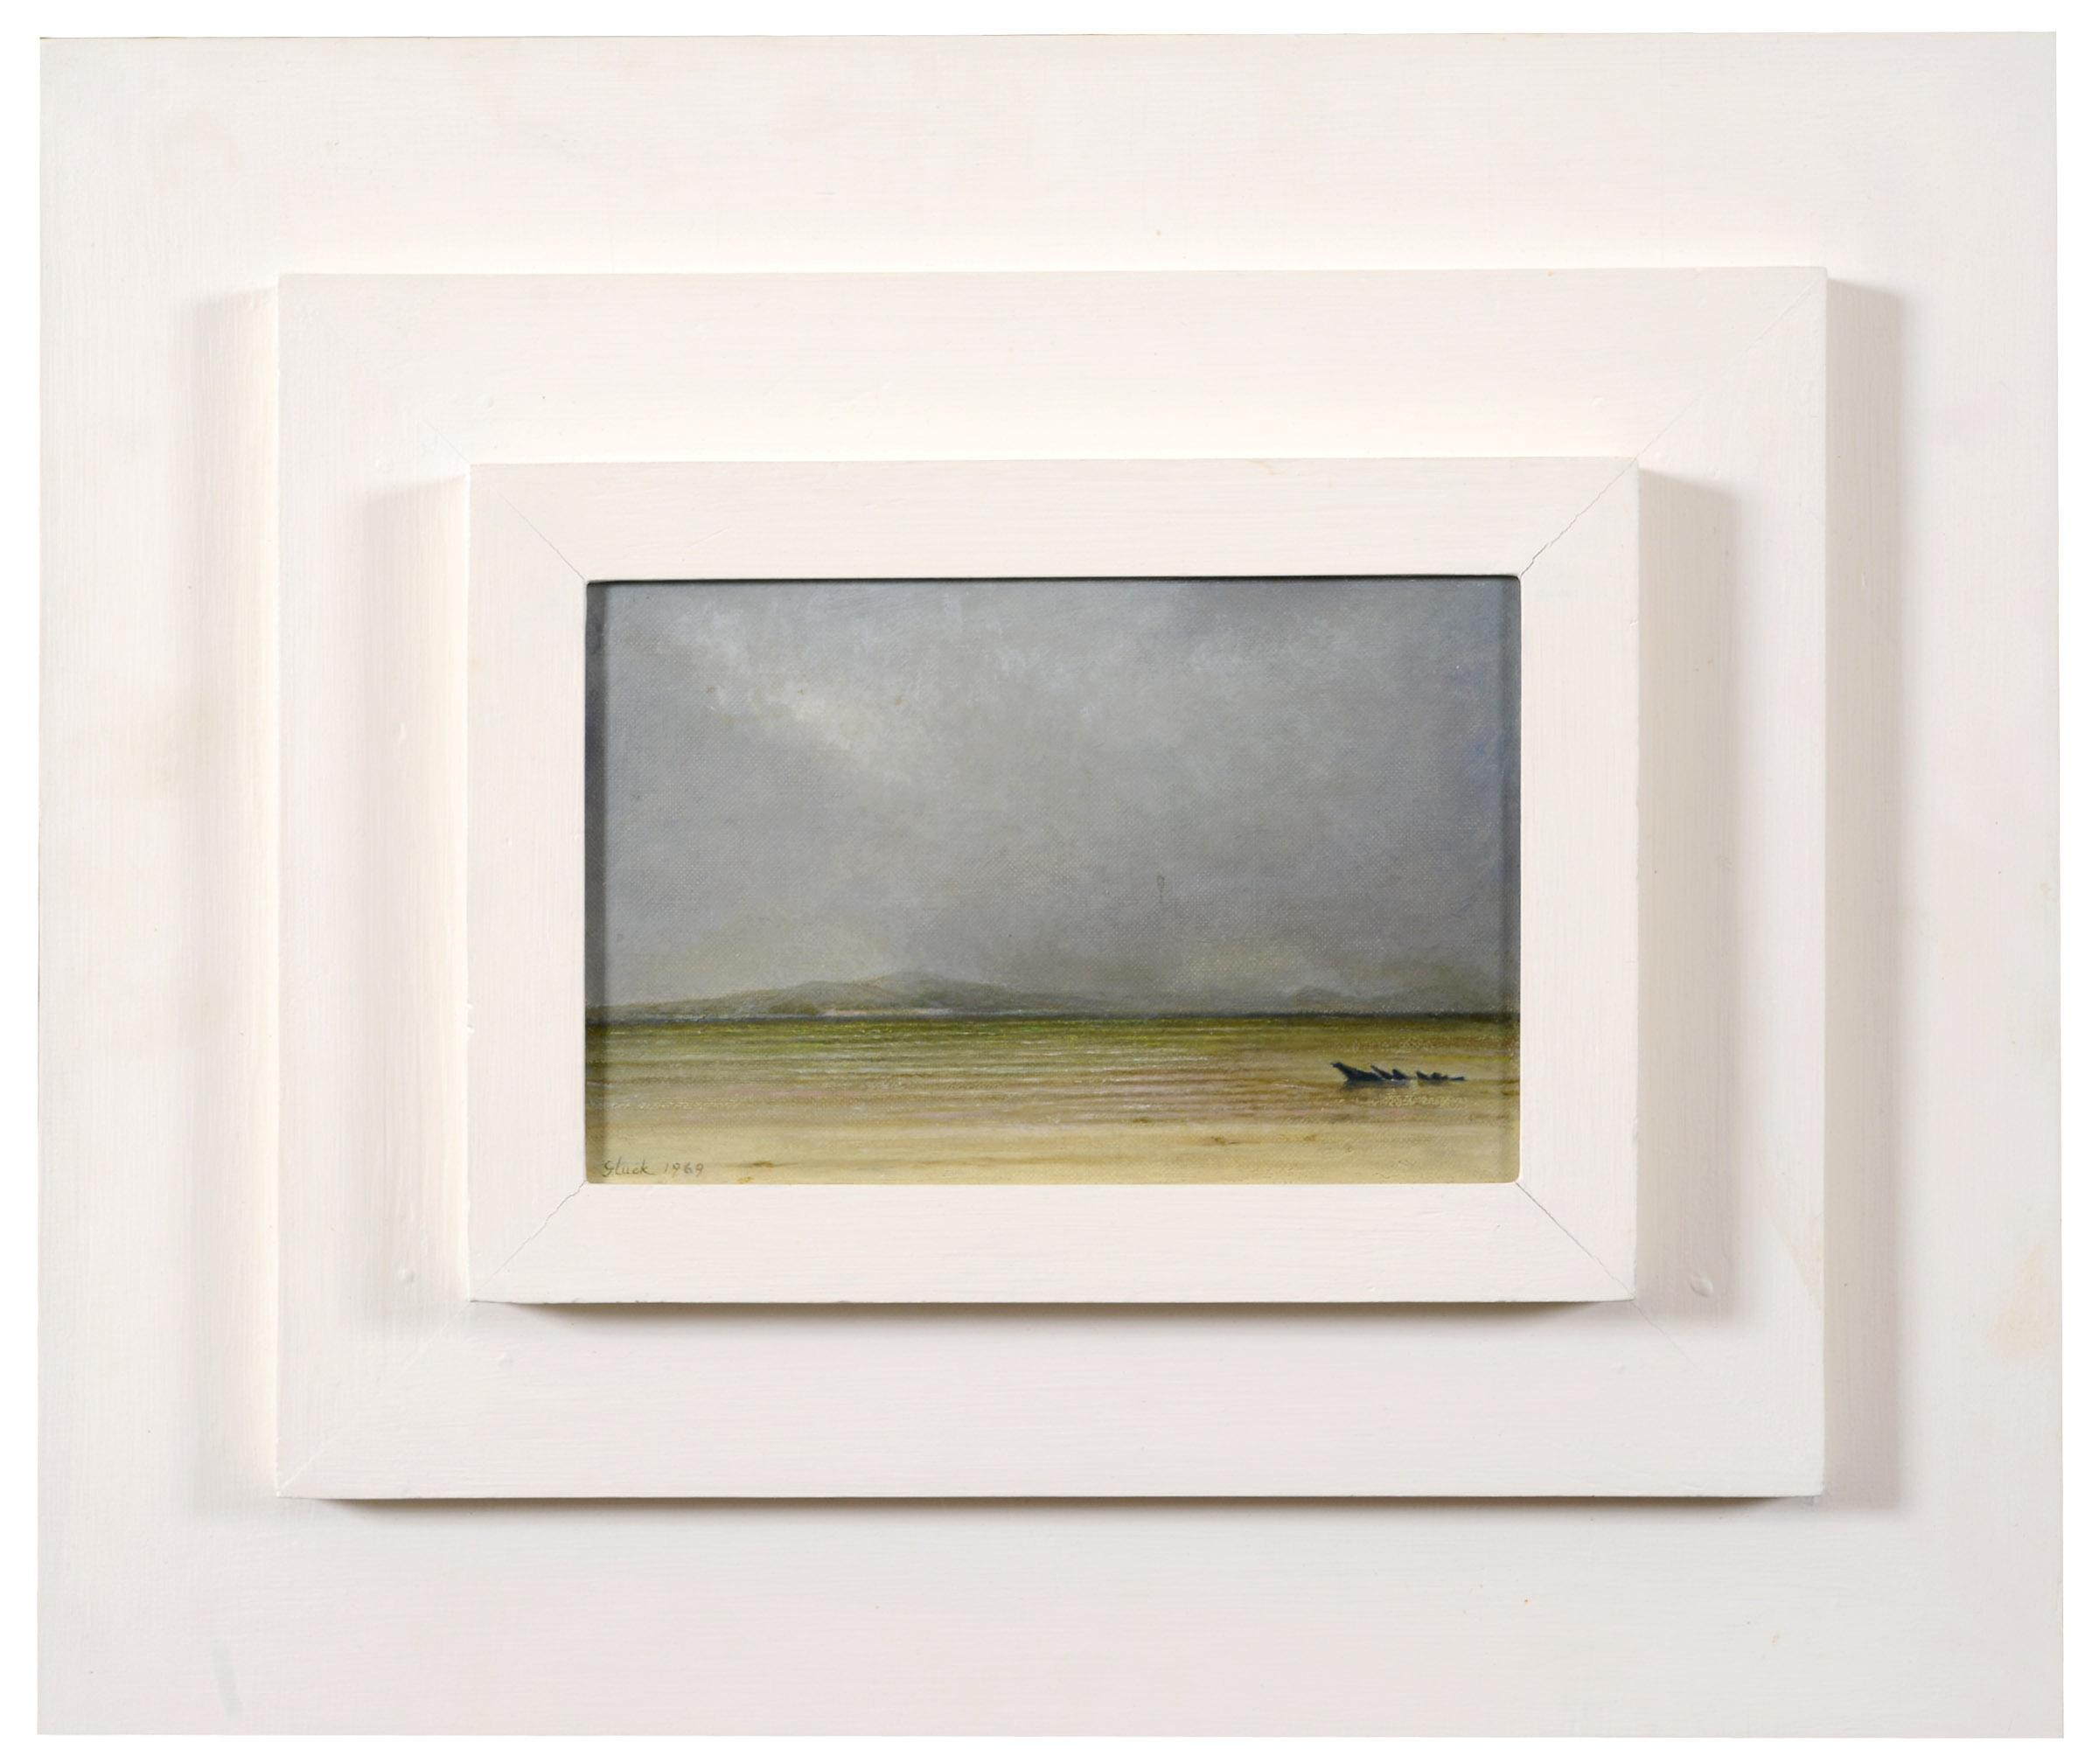 Lot 1965 - •`GLUCK` (HANNAH GLUCKSTEIN) (1895-1978) SEASCAPE Signed and dated Gluck 1969, oil on canvas